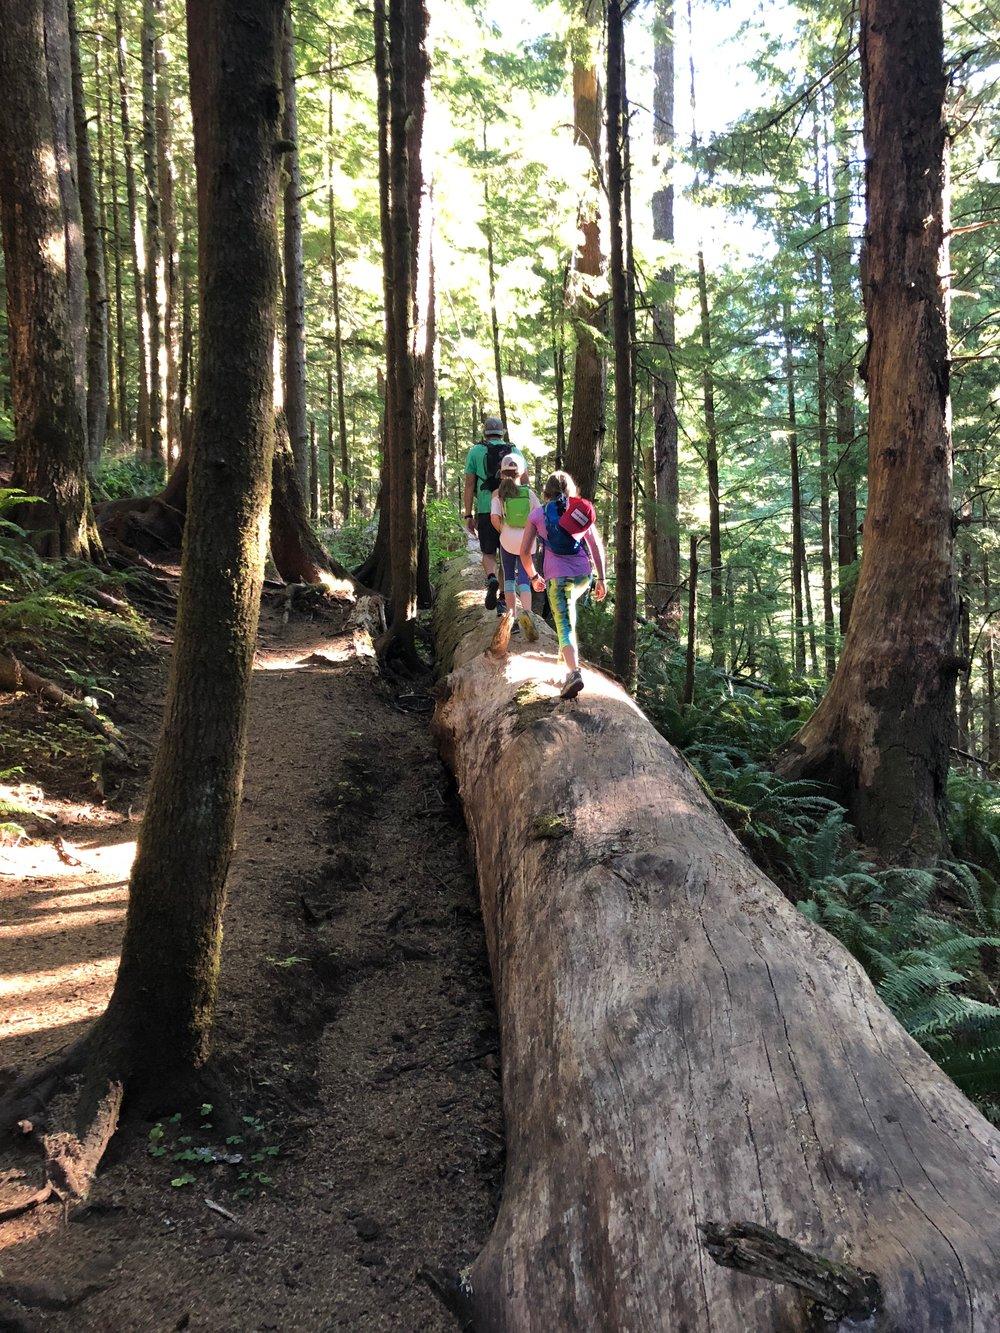 Hiking the Neahkanie Trail